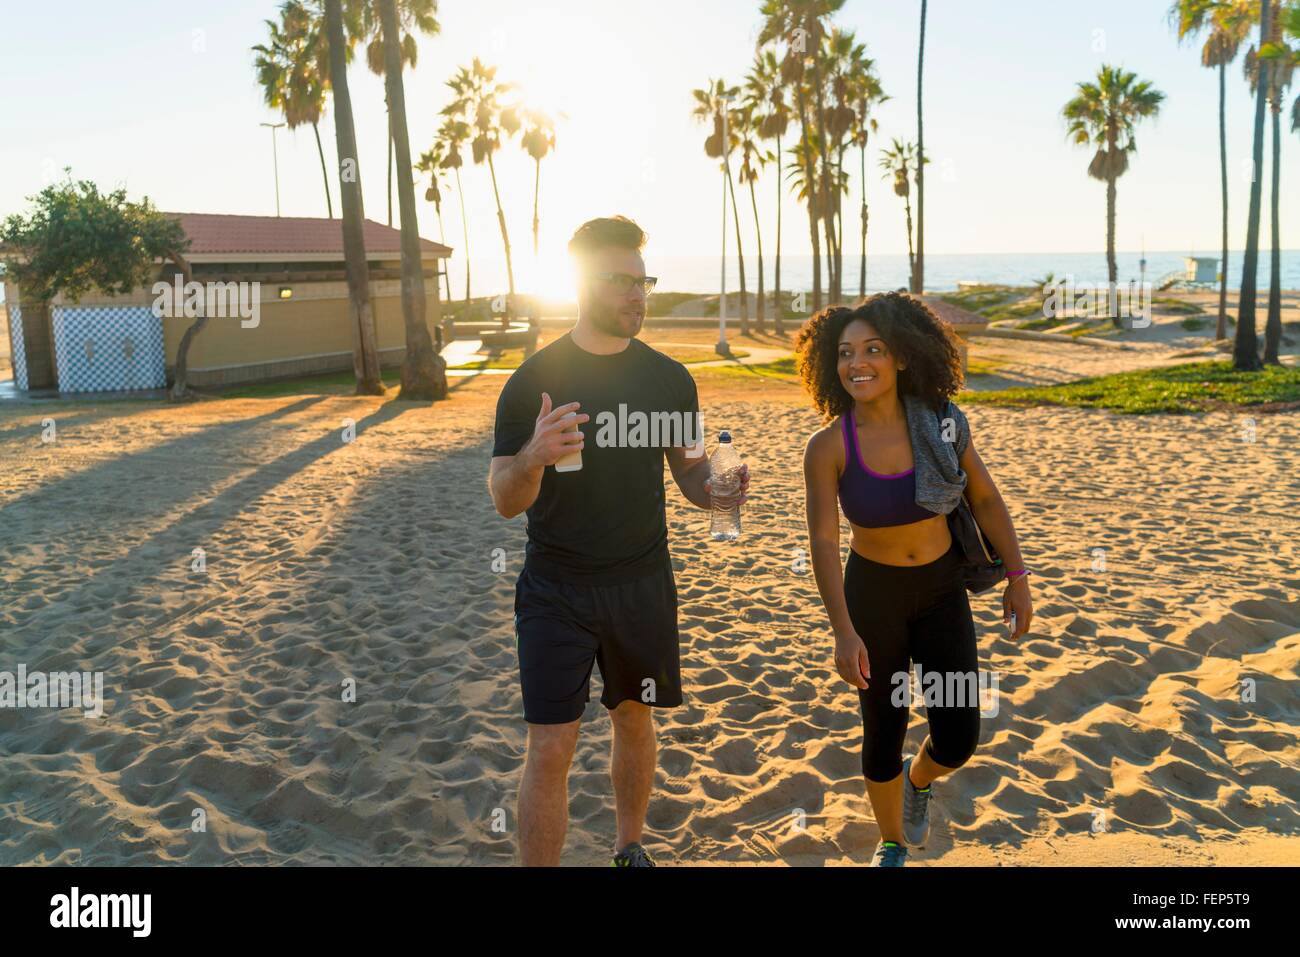 Paar tragen Sport Kleidung, Strand entlang spazieren, reden Stockbild